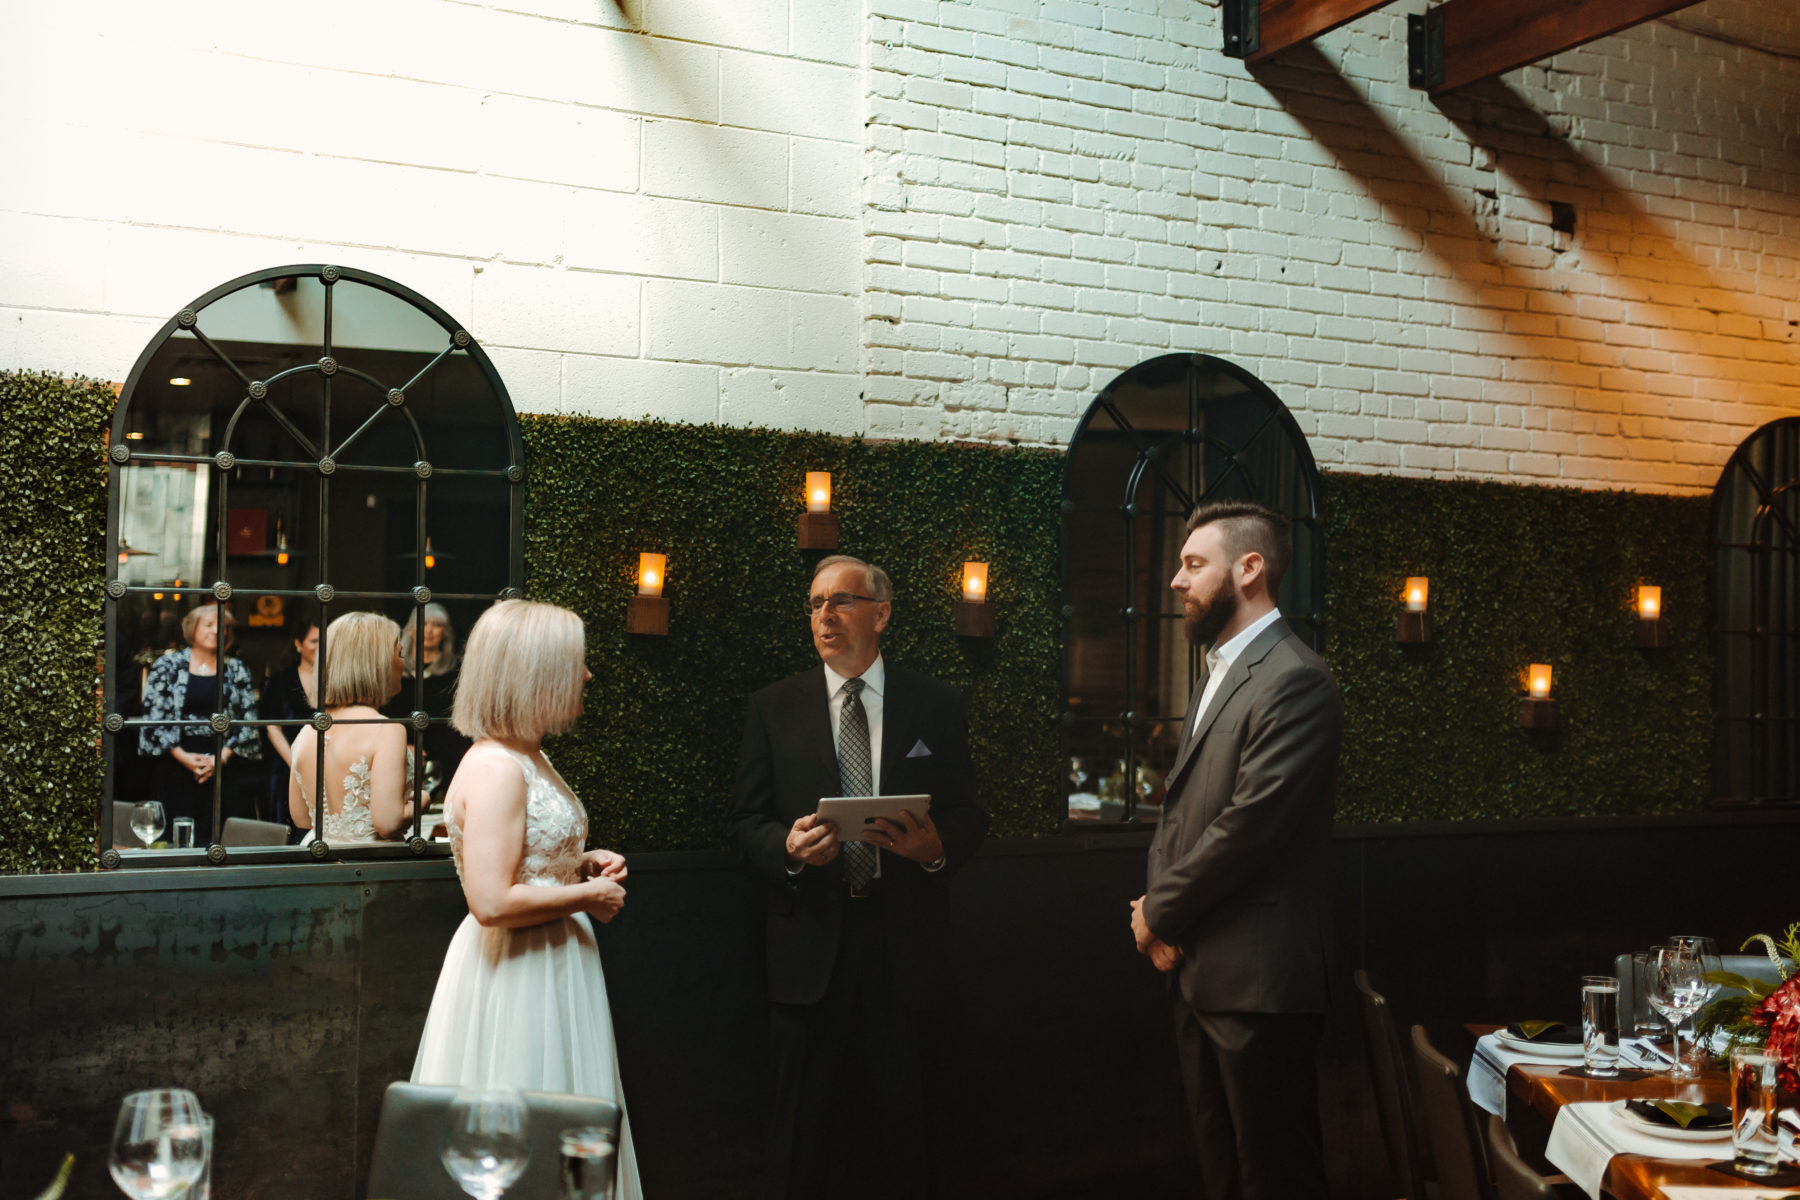 Elopement ceremony: Nashville brunch elopement featured on Nashville Bride Guide